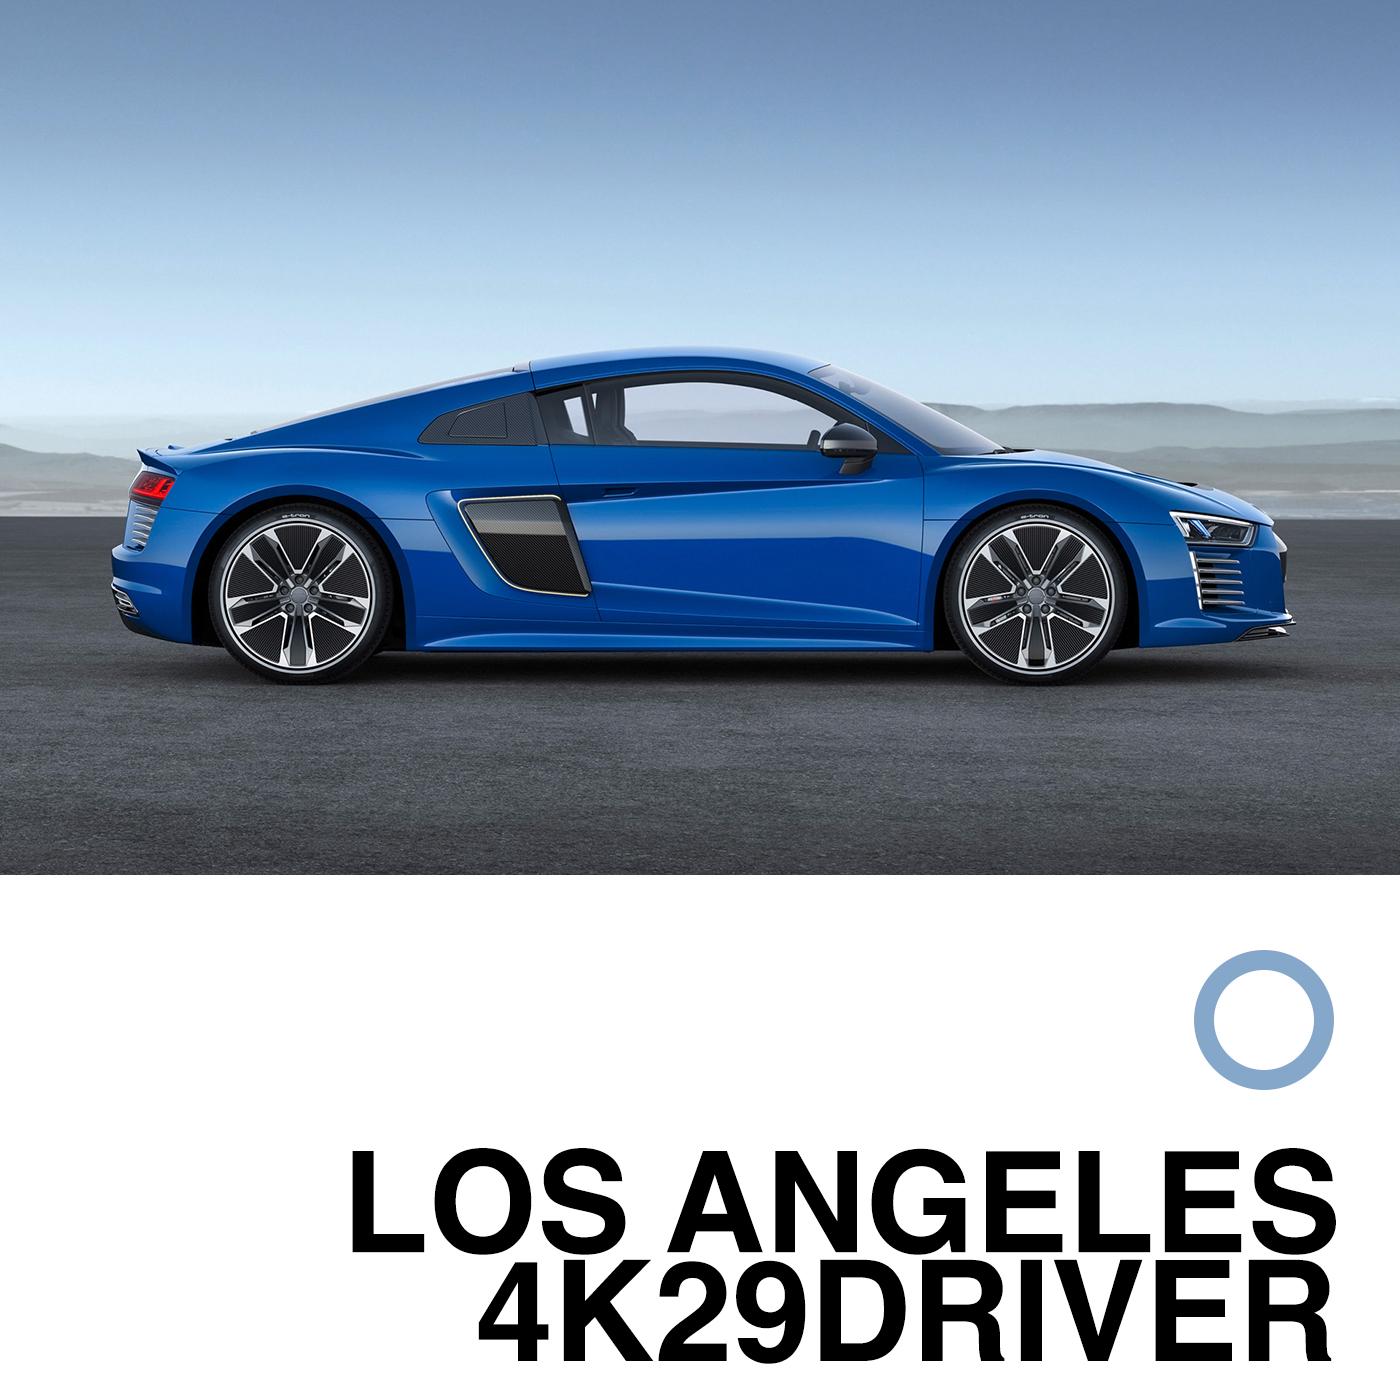 LOS ANGELES 4K29DRIVER